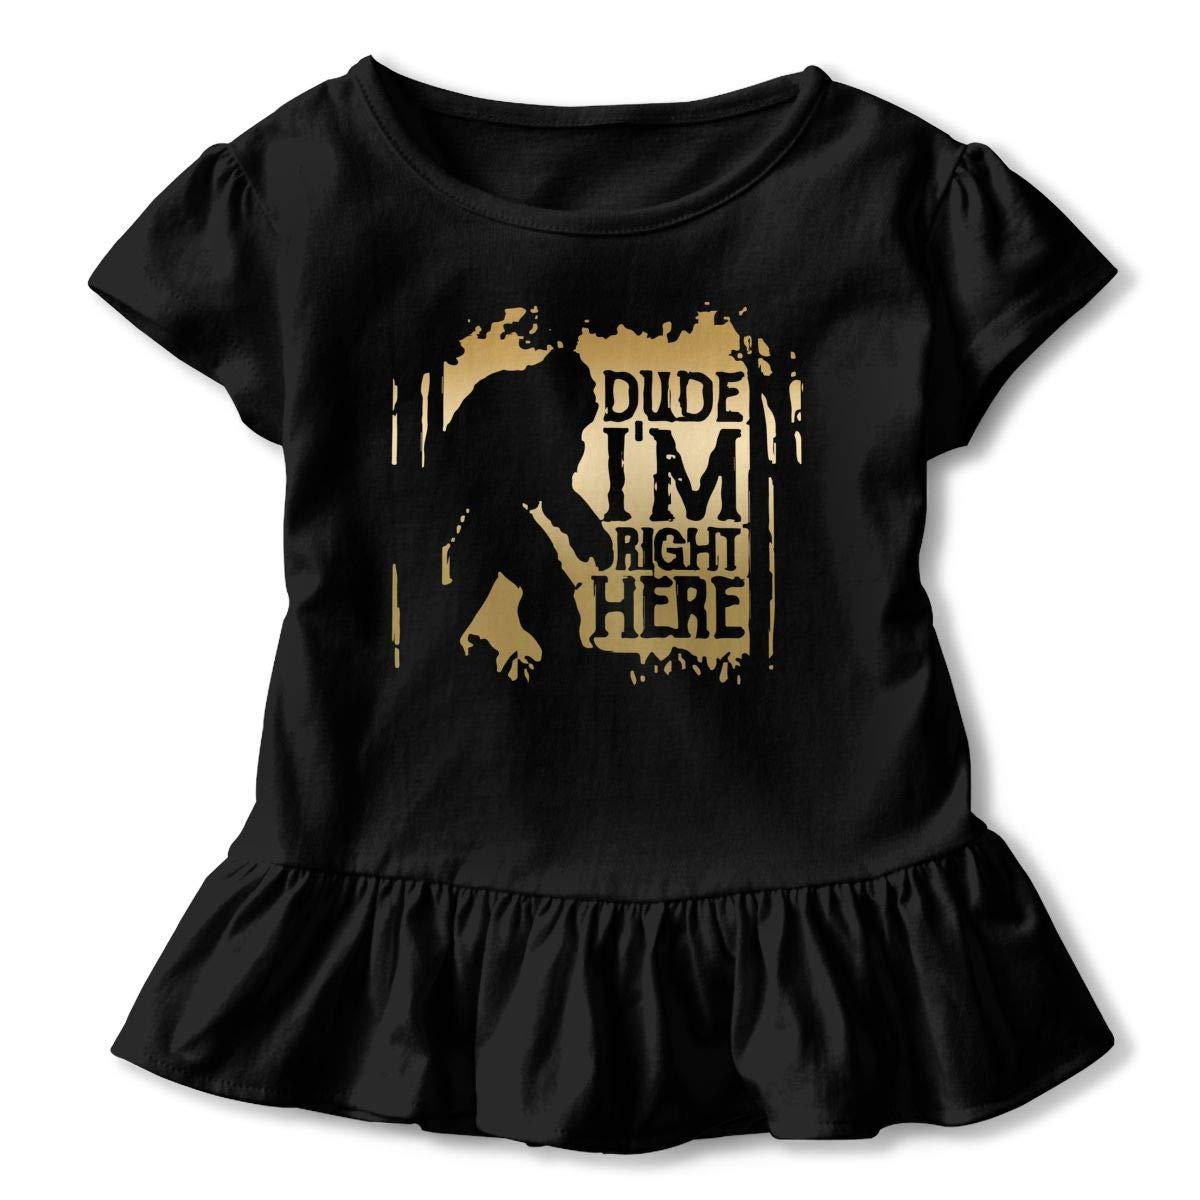 CZnuen Bigfoot Sasquatch Dude Im Right Here 2-6T Baby Girls Cotton Jersey Short Sleeve Ruffle Tee